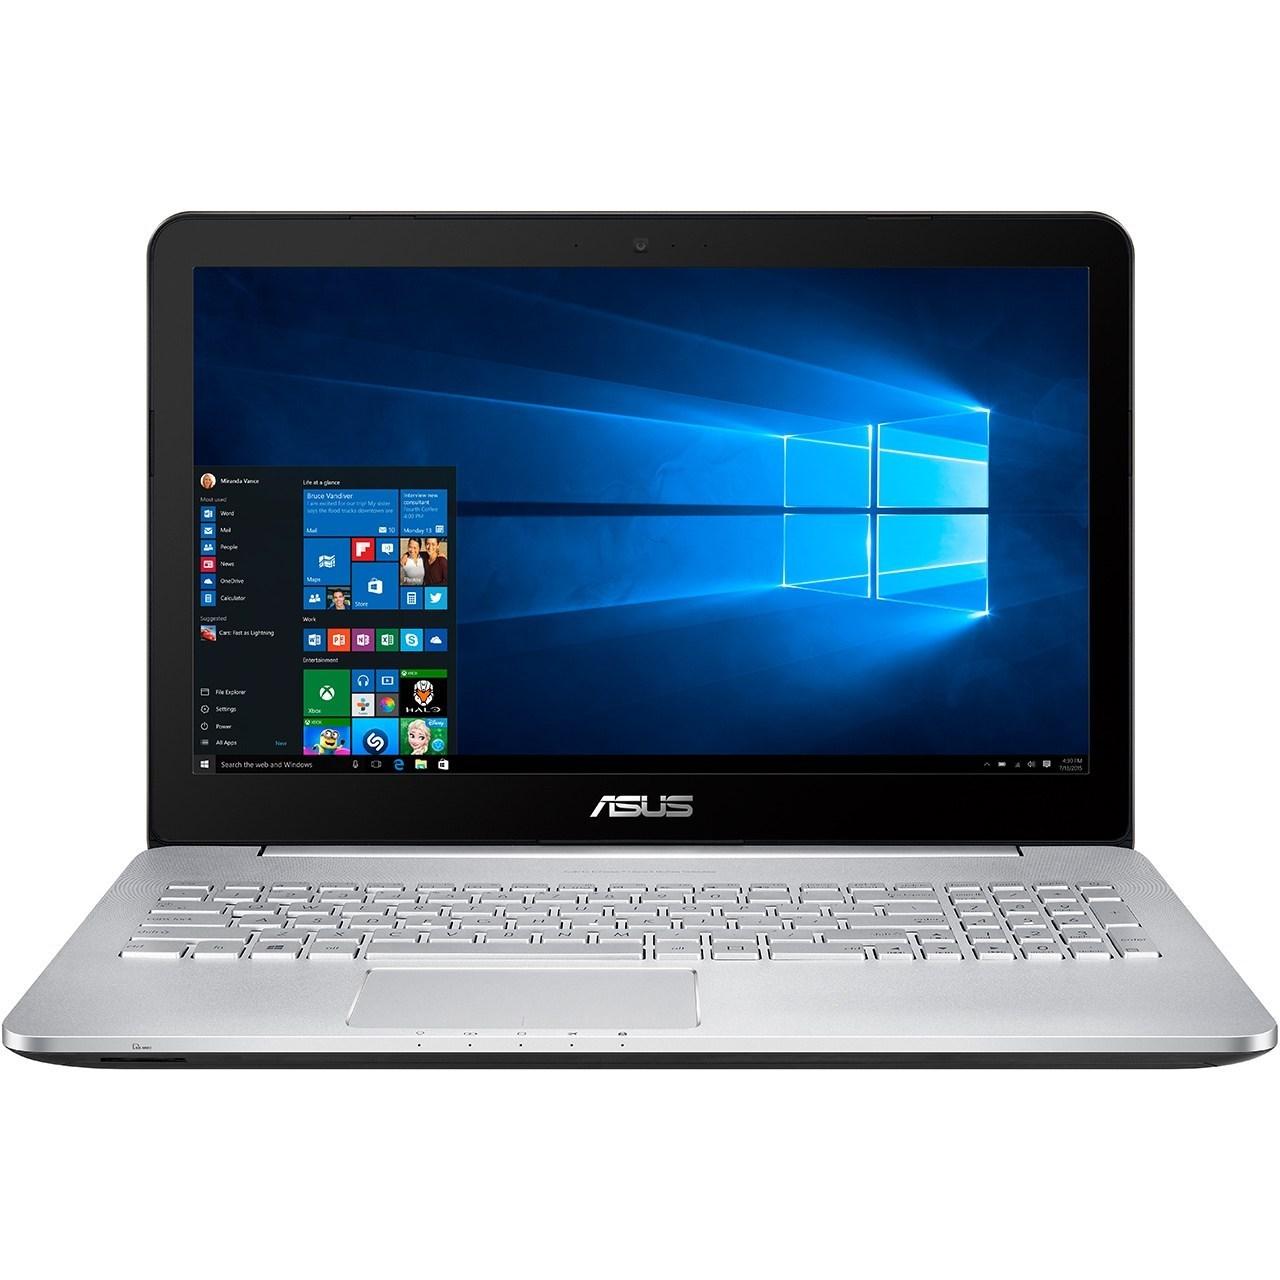 لپ تاپ 15 اینچی ایسوس مدل N552VW - K